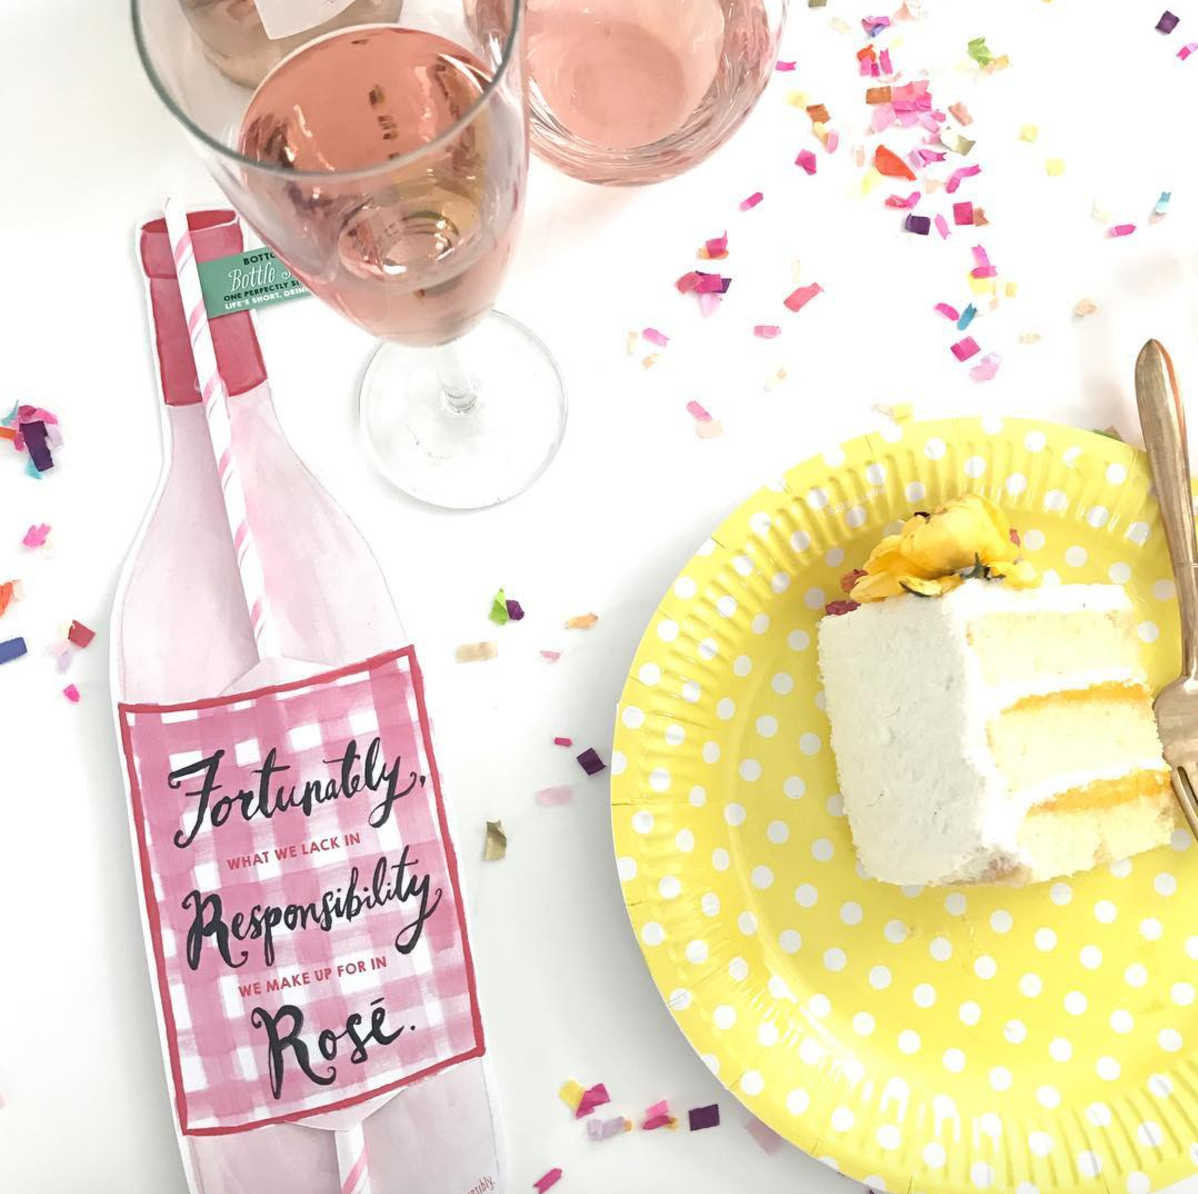 Rose Wine Straw Pack